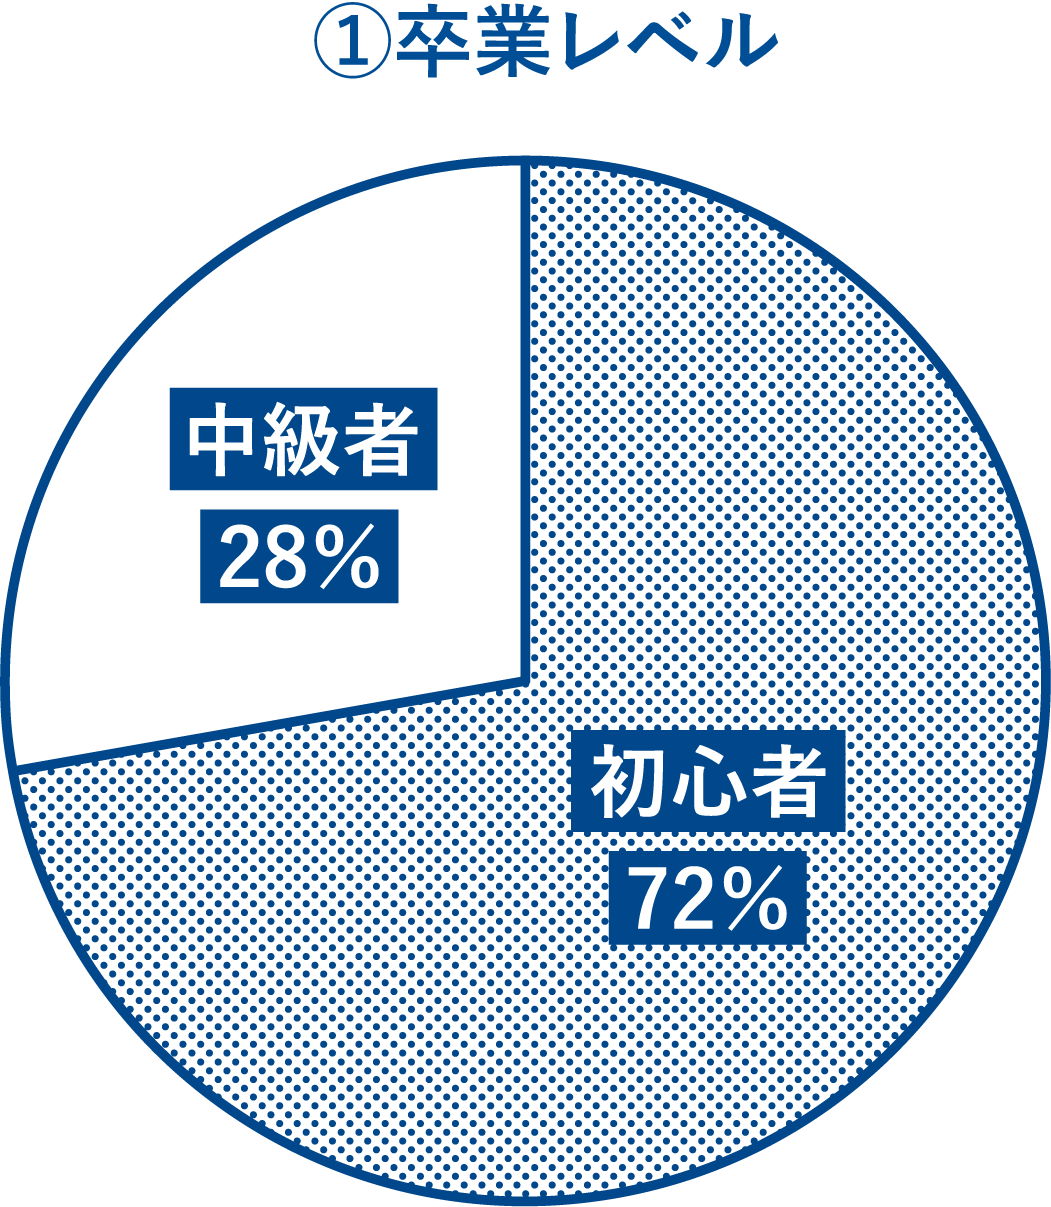 MAJOLIビデオヨガコース 初心者と中級者の割合